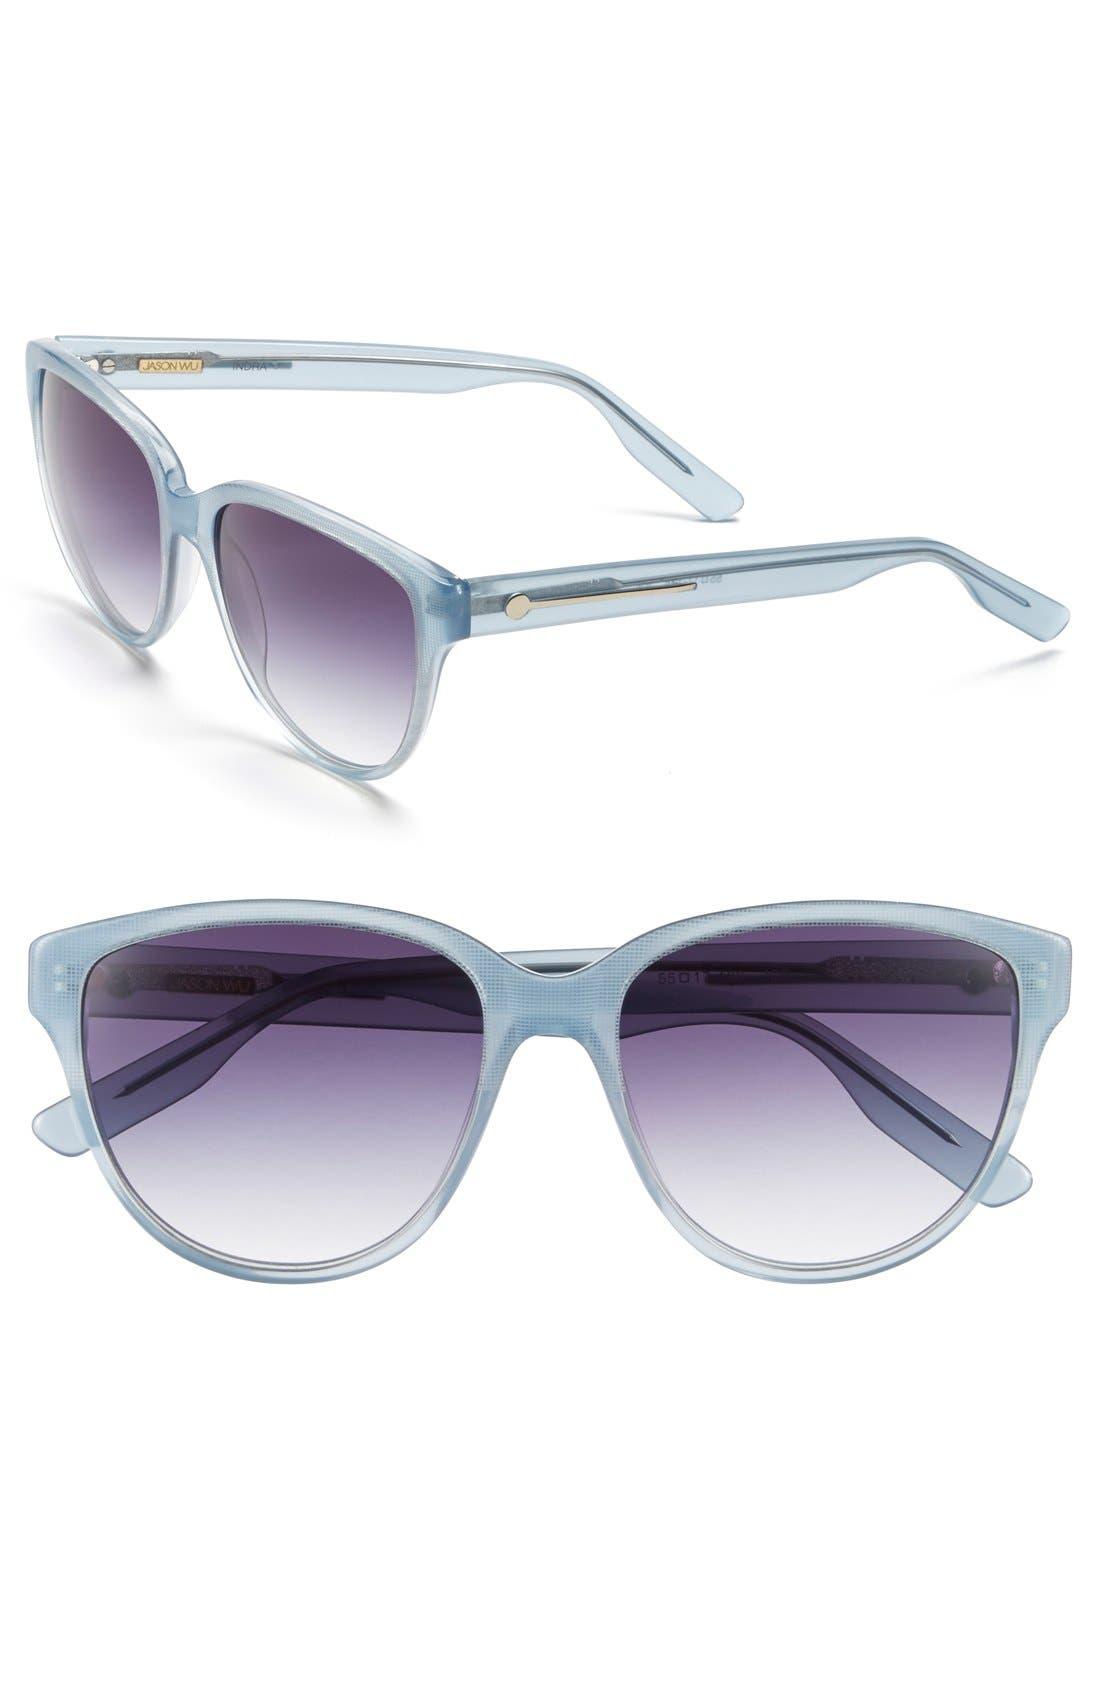 Alternate Image 1 Selected - Jason Wu 'Indra' 55mm Sunglasses